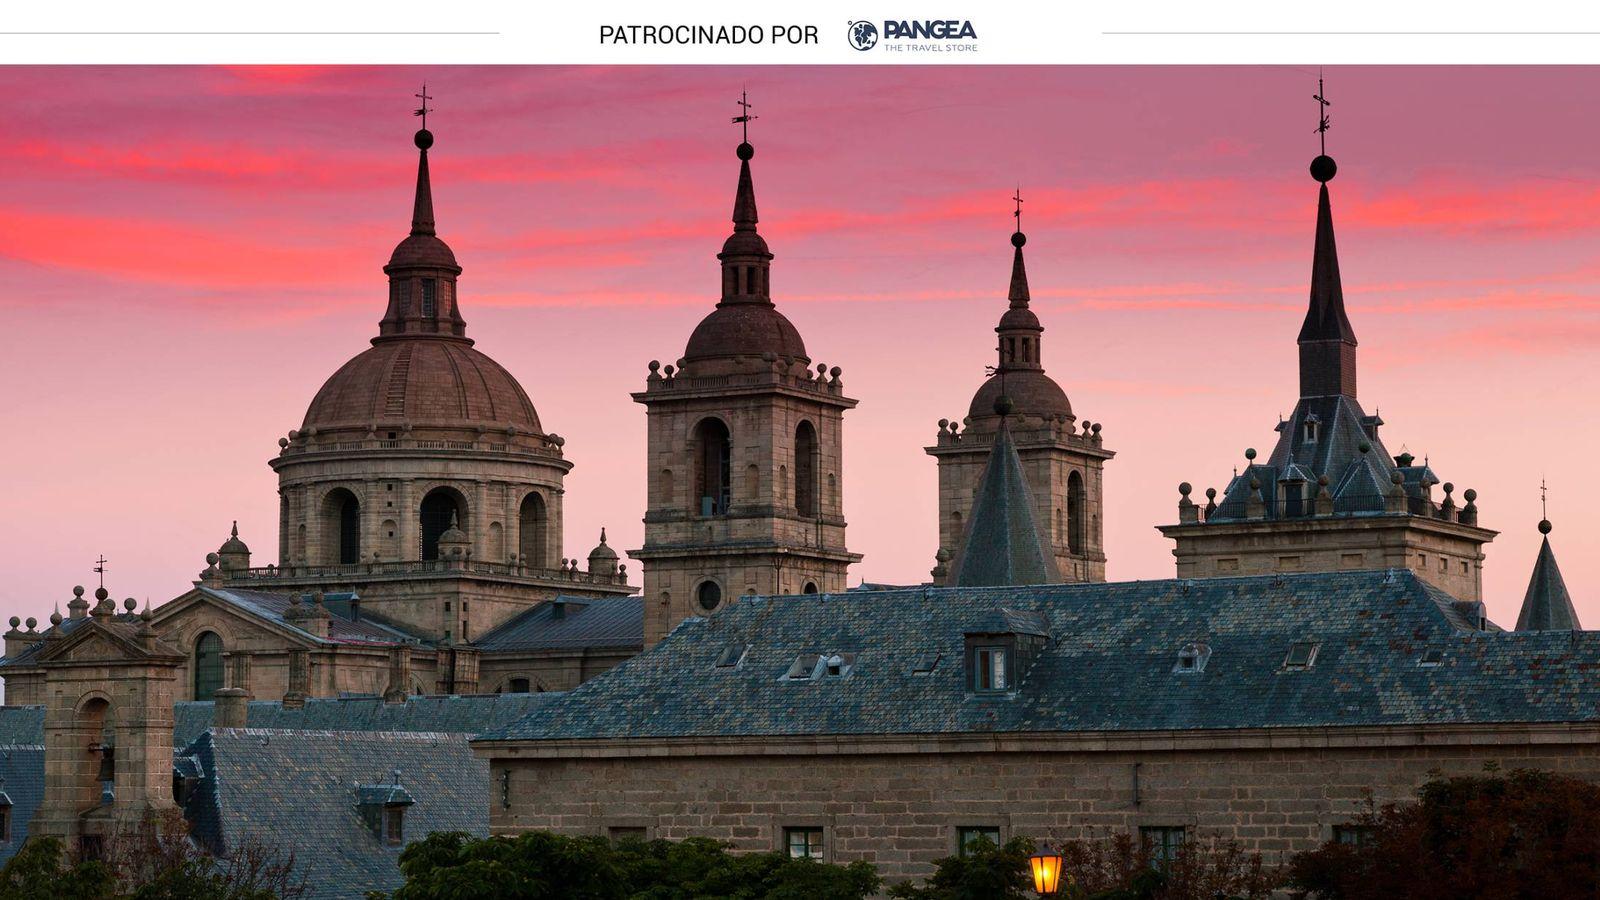 visita monasterio escorial